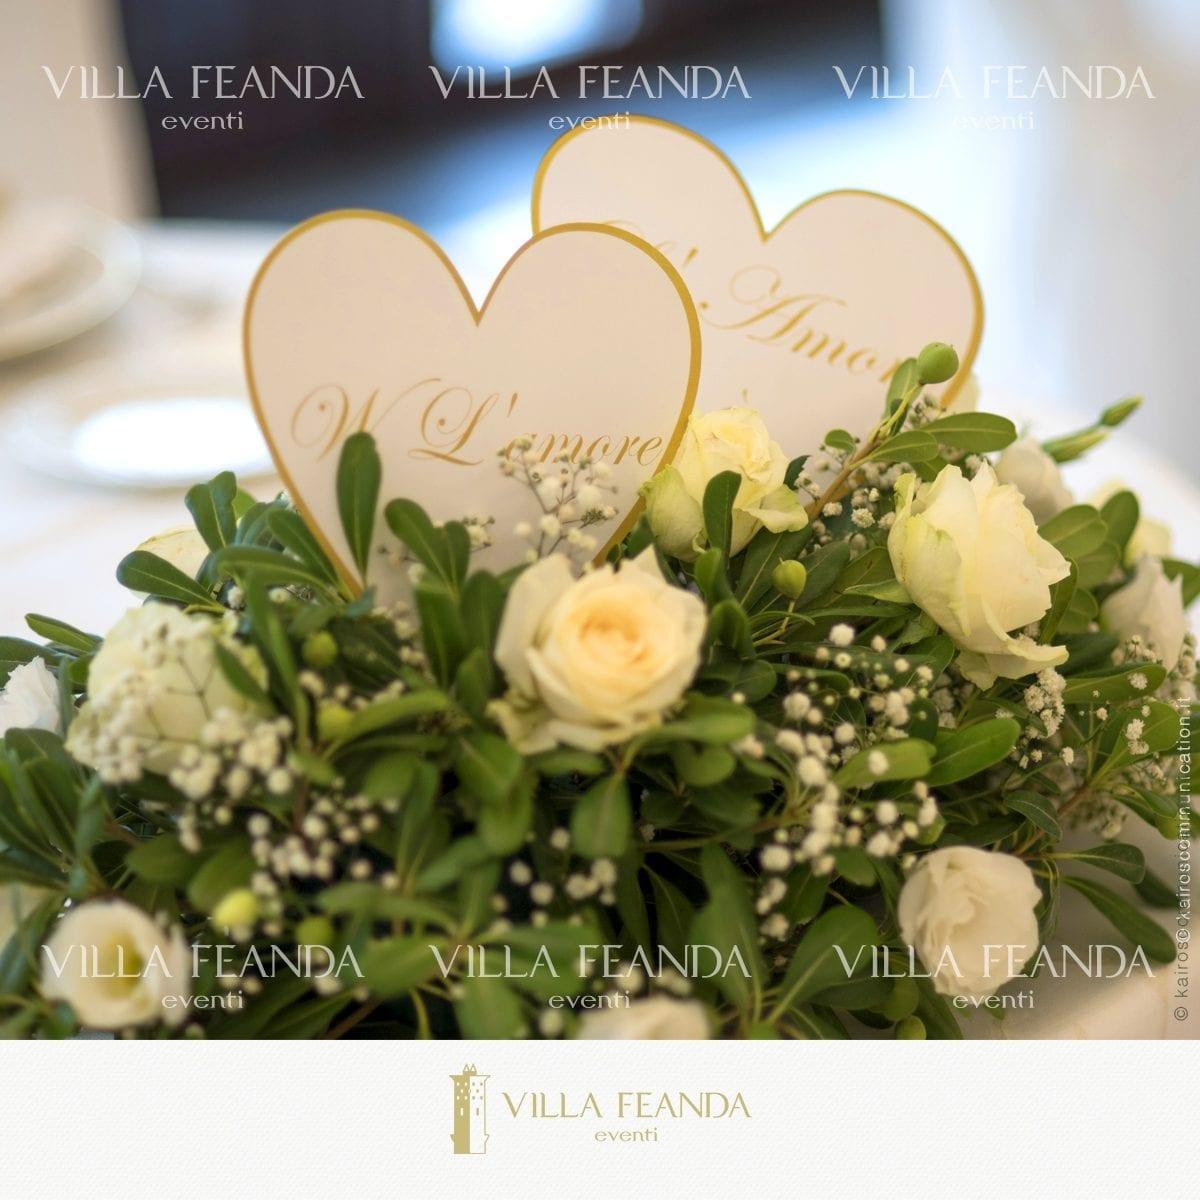 Frasi Matrimonio Formali.Frasi Per Matrimoni Villa Feanda Eventi